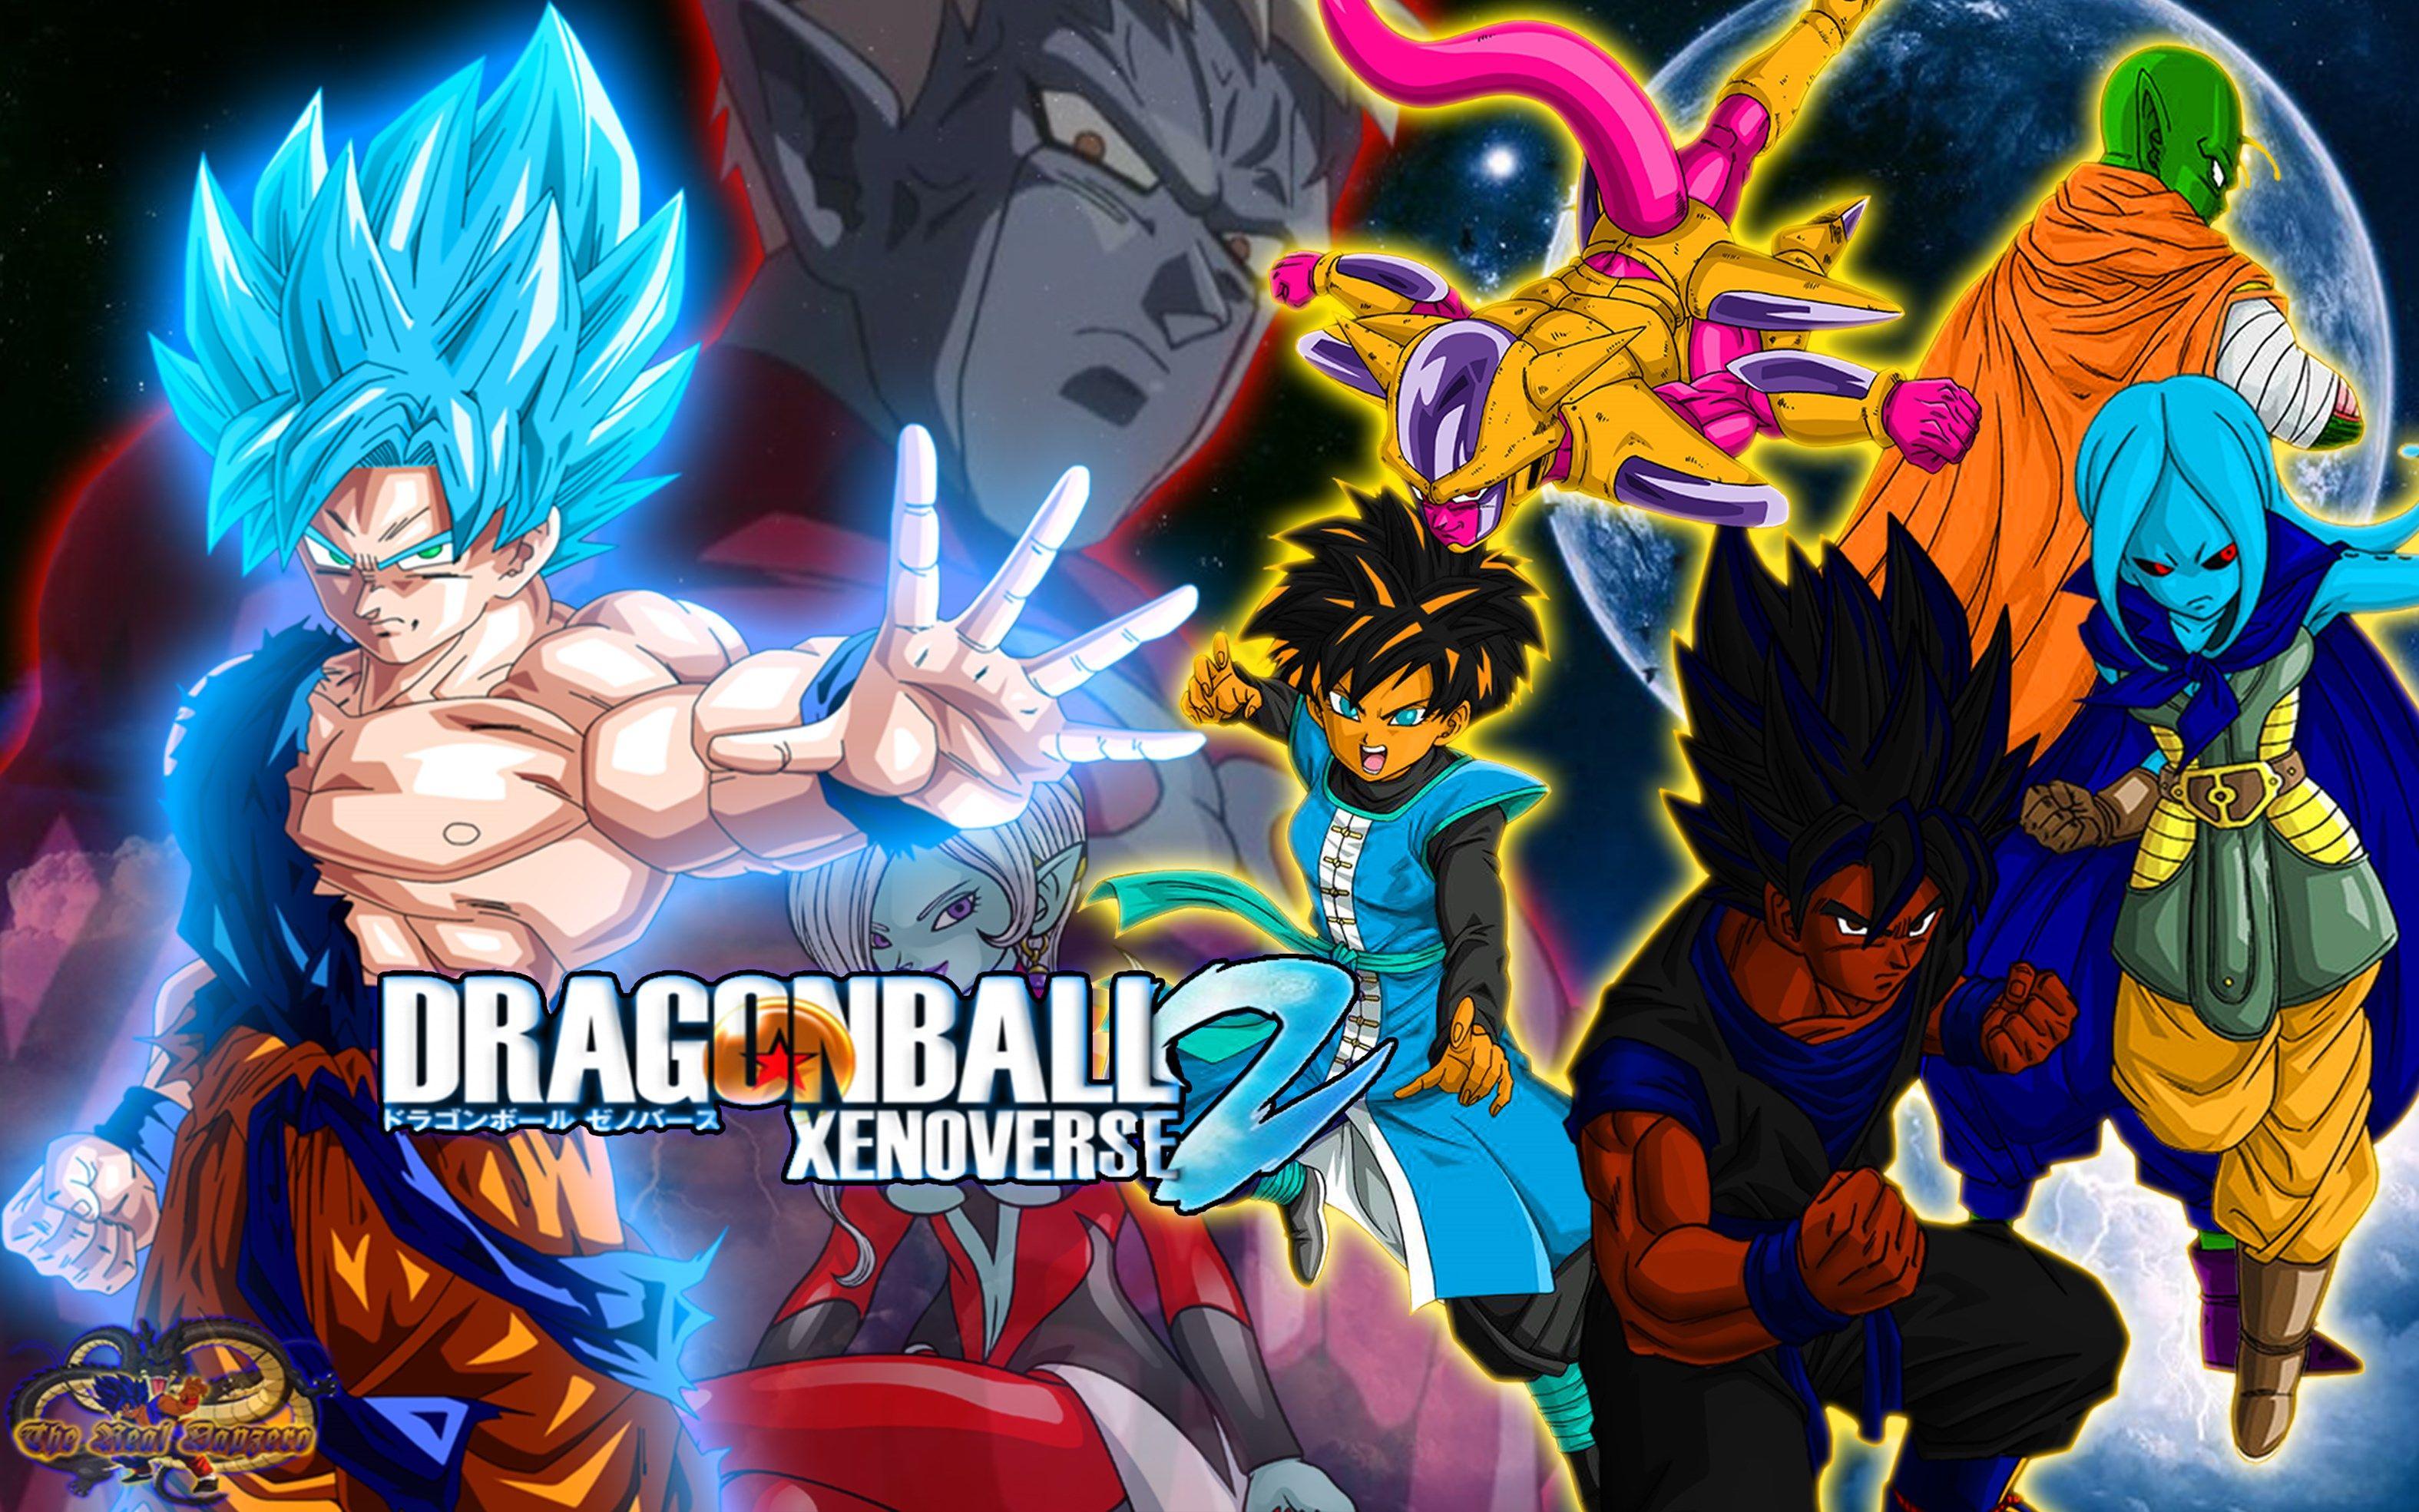 Dragon Ball Xenoverse 2 Review Keengamer Pc Games Download Dragon Games Dragon Ball